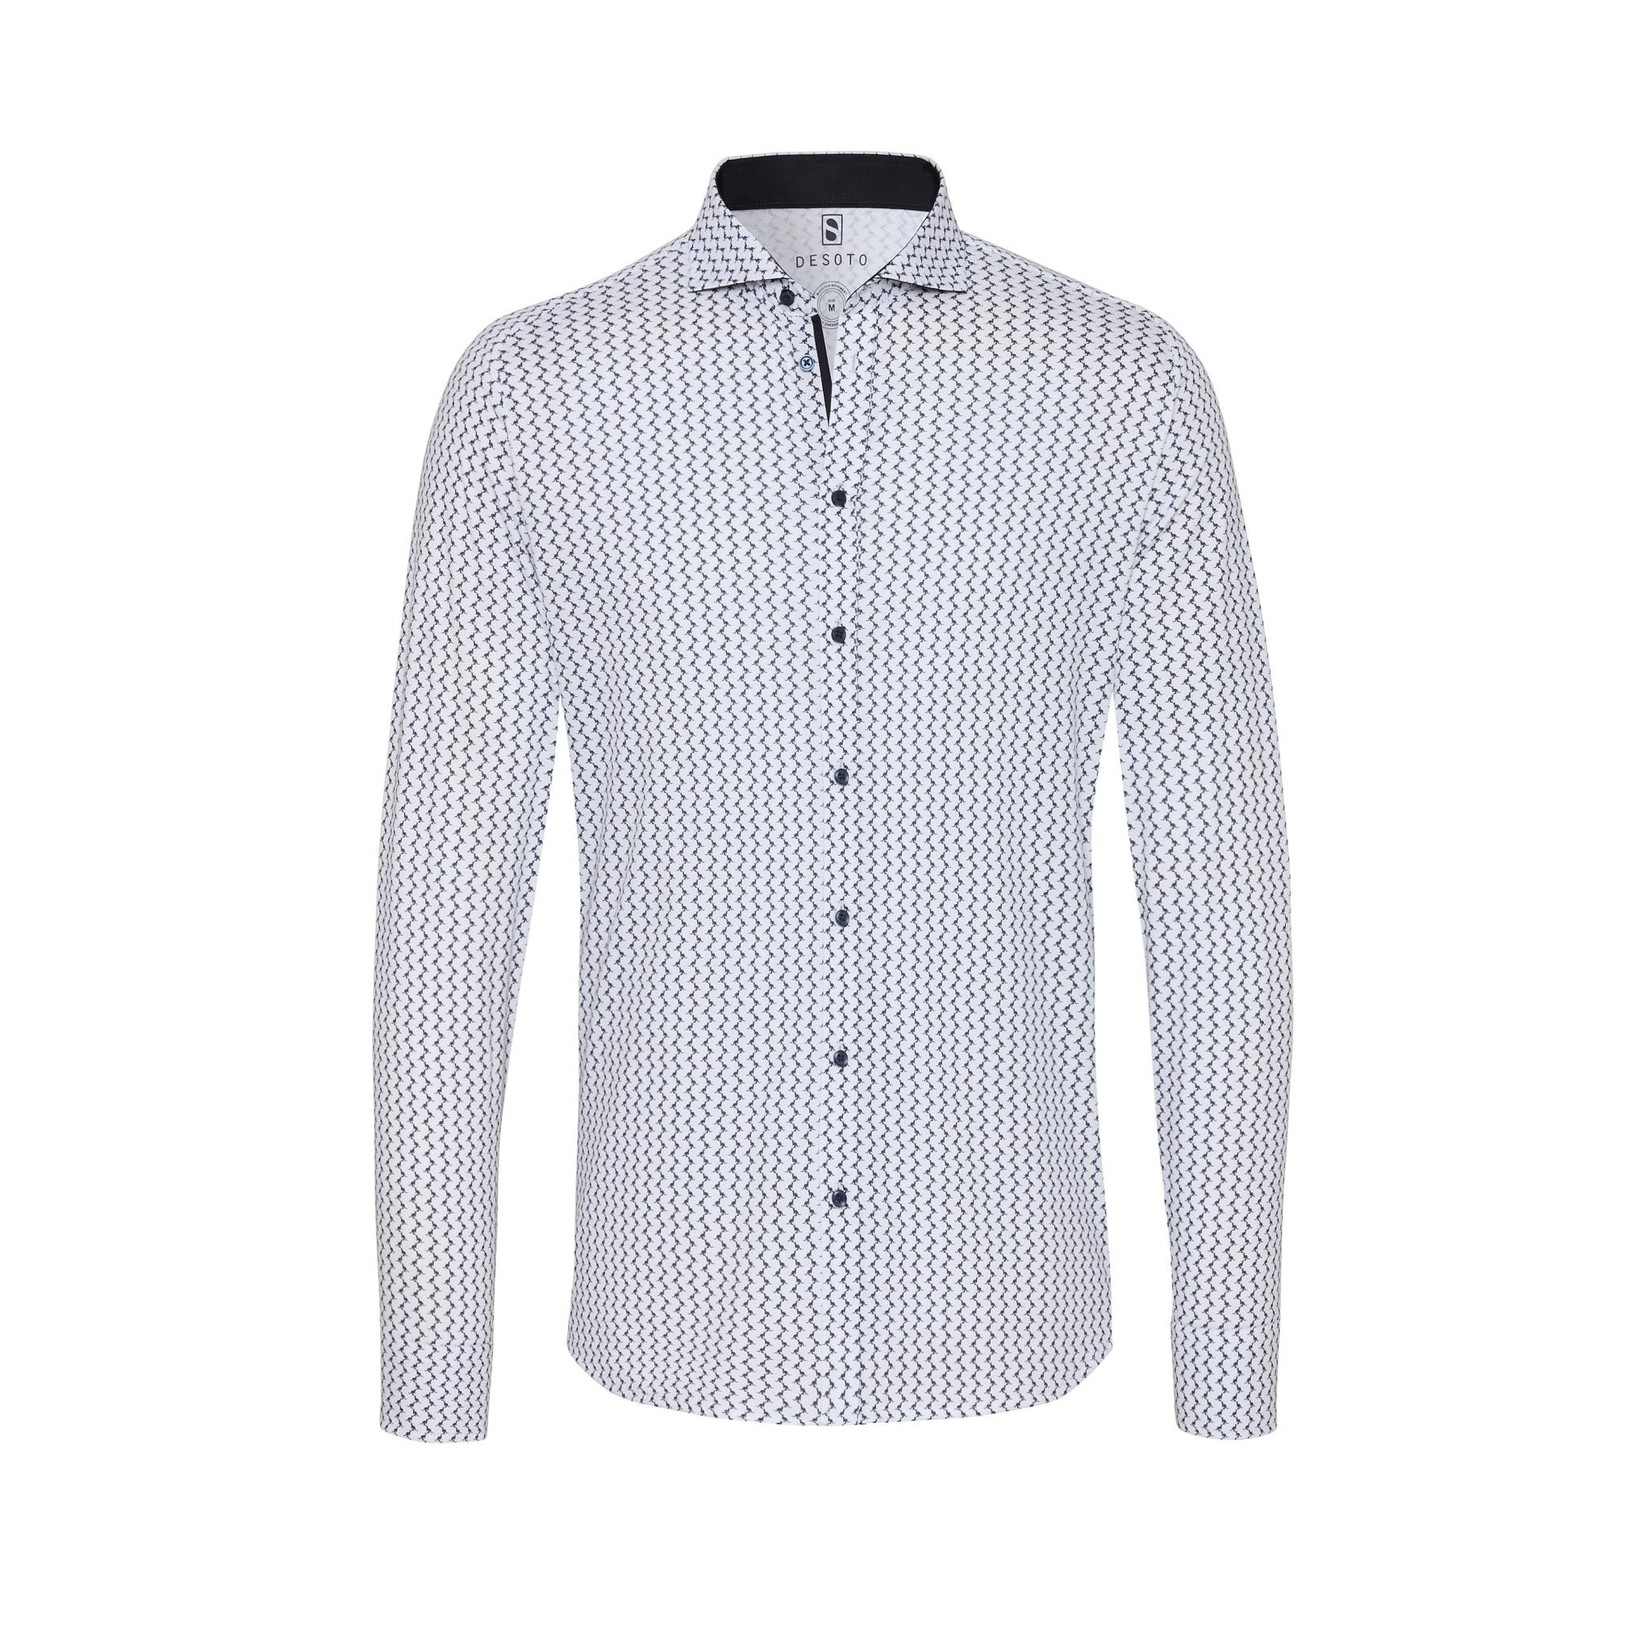 Desoto jersey overhemd wit marine print